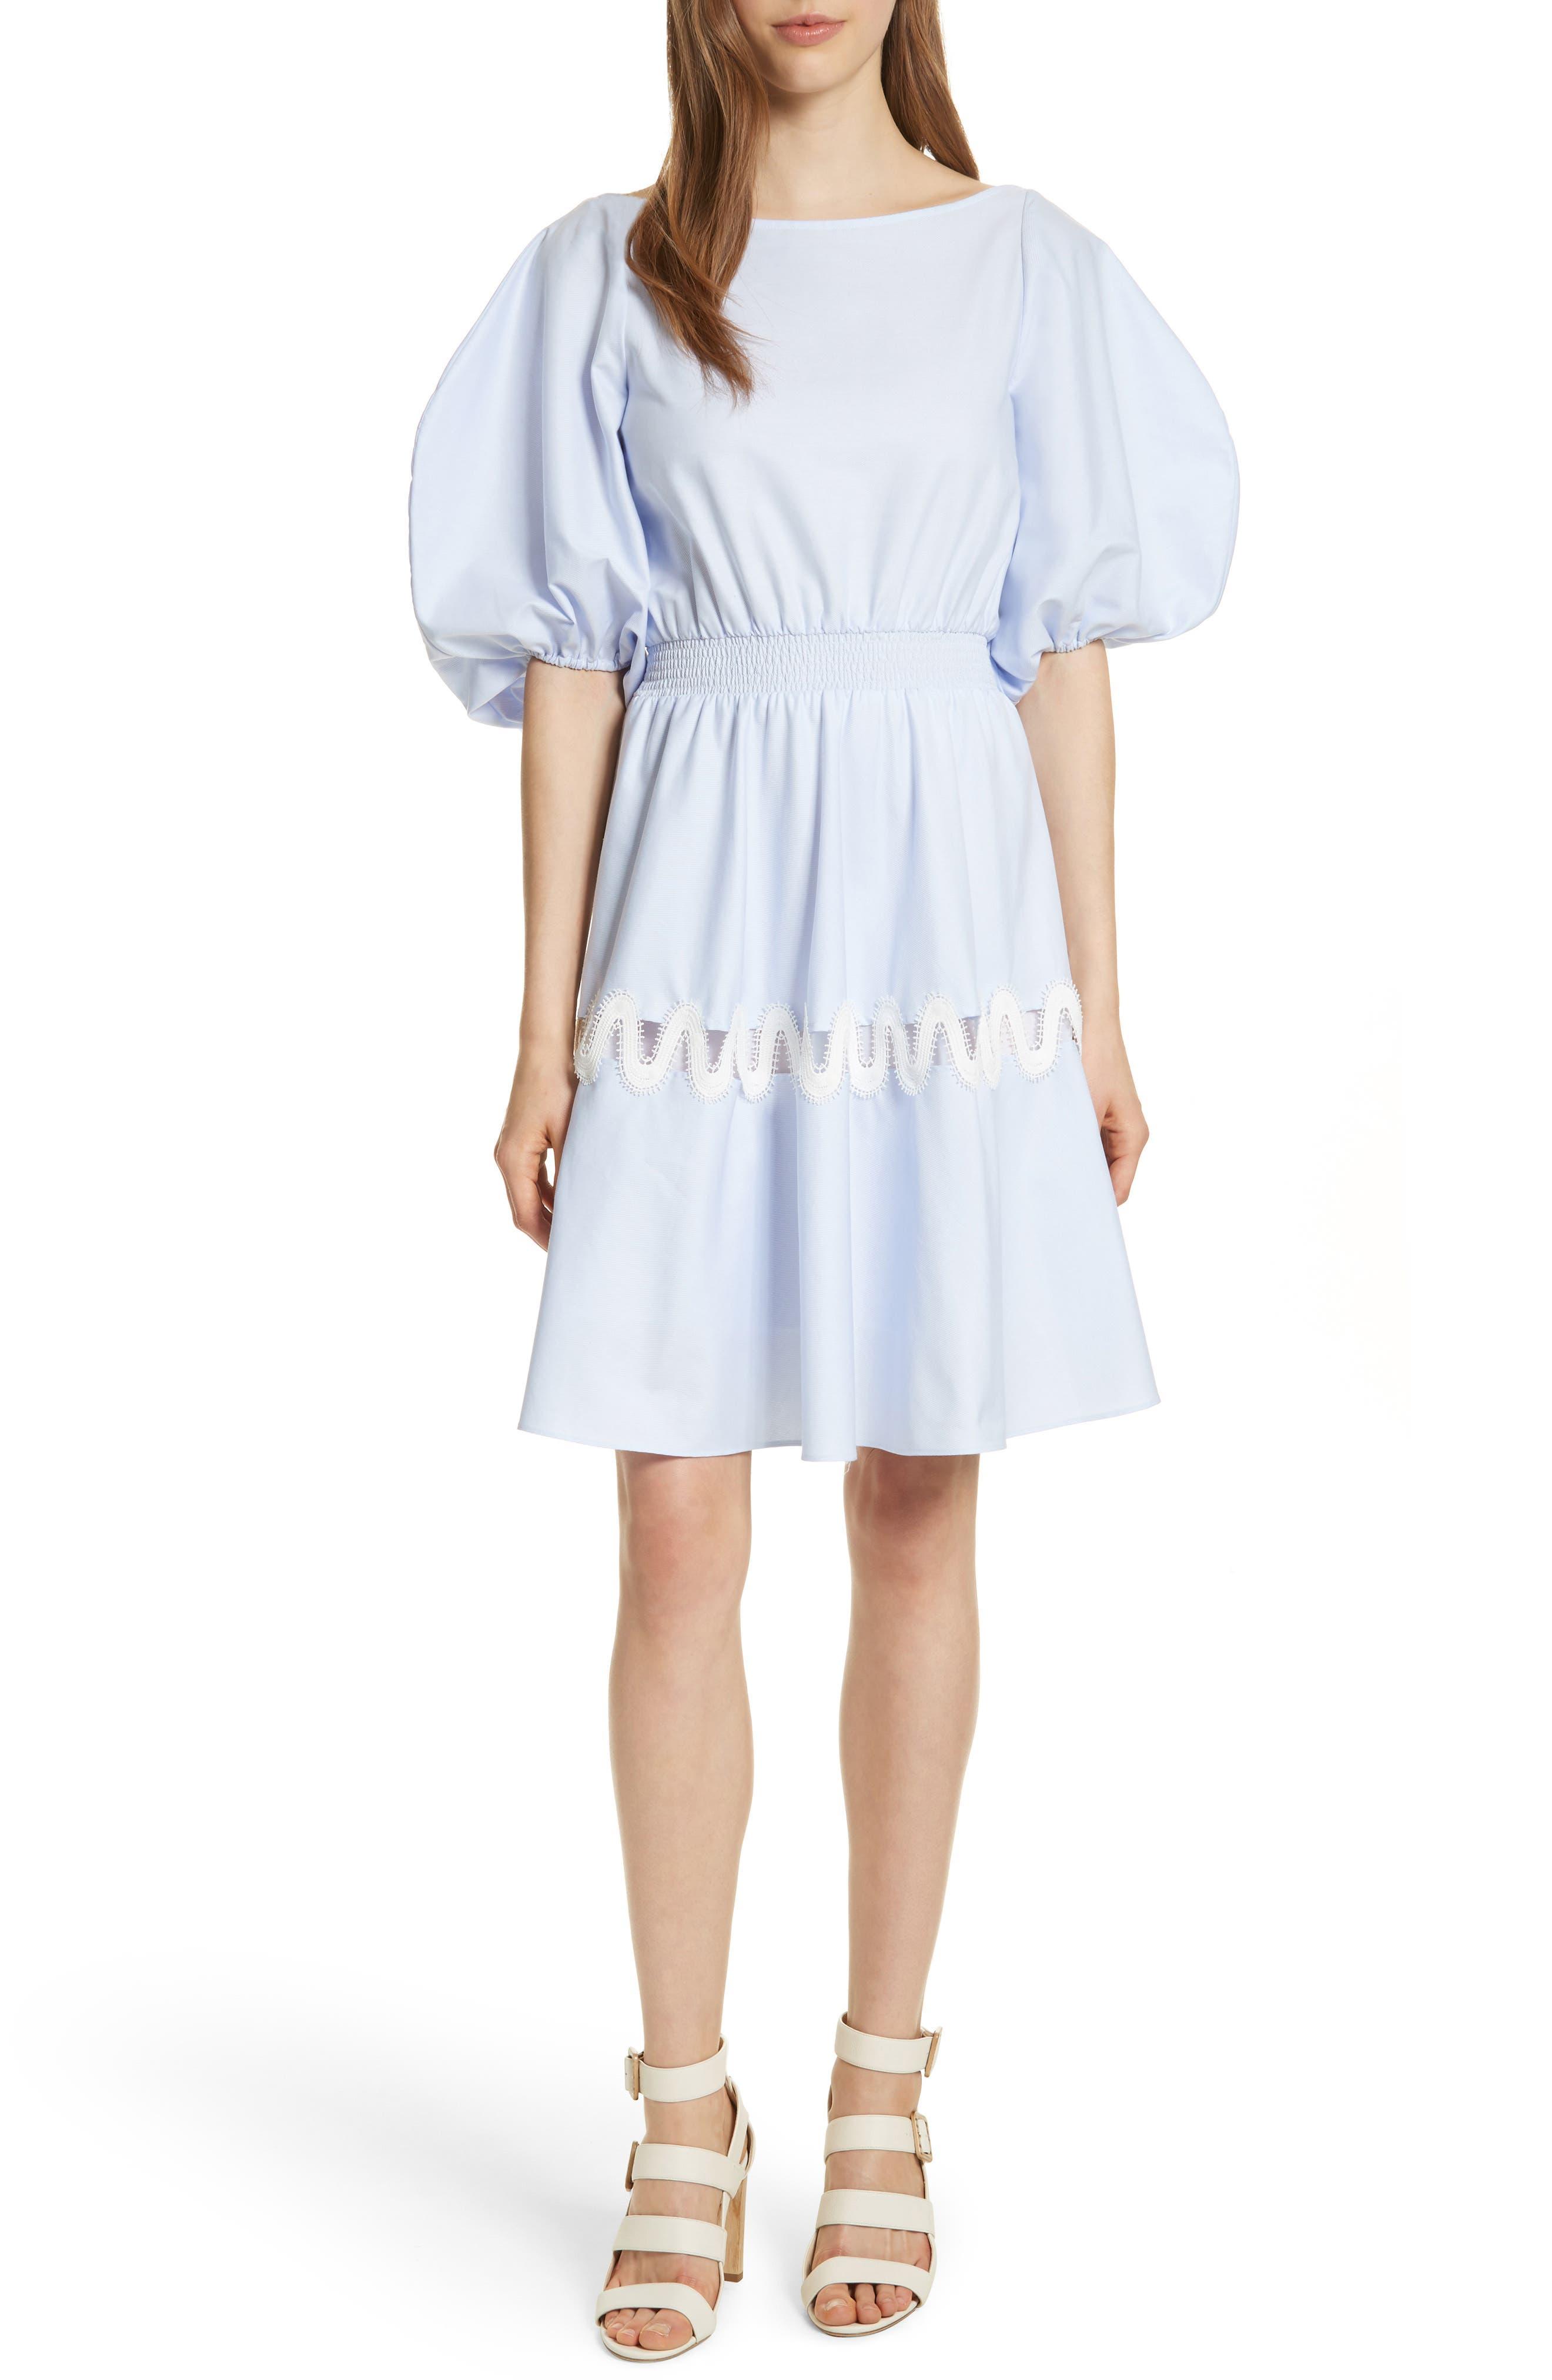 Prose & Poetry Charleene Cotton Balloon Sleeve Dress,                         Main,                         color,